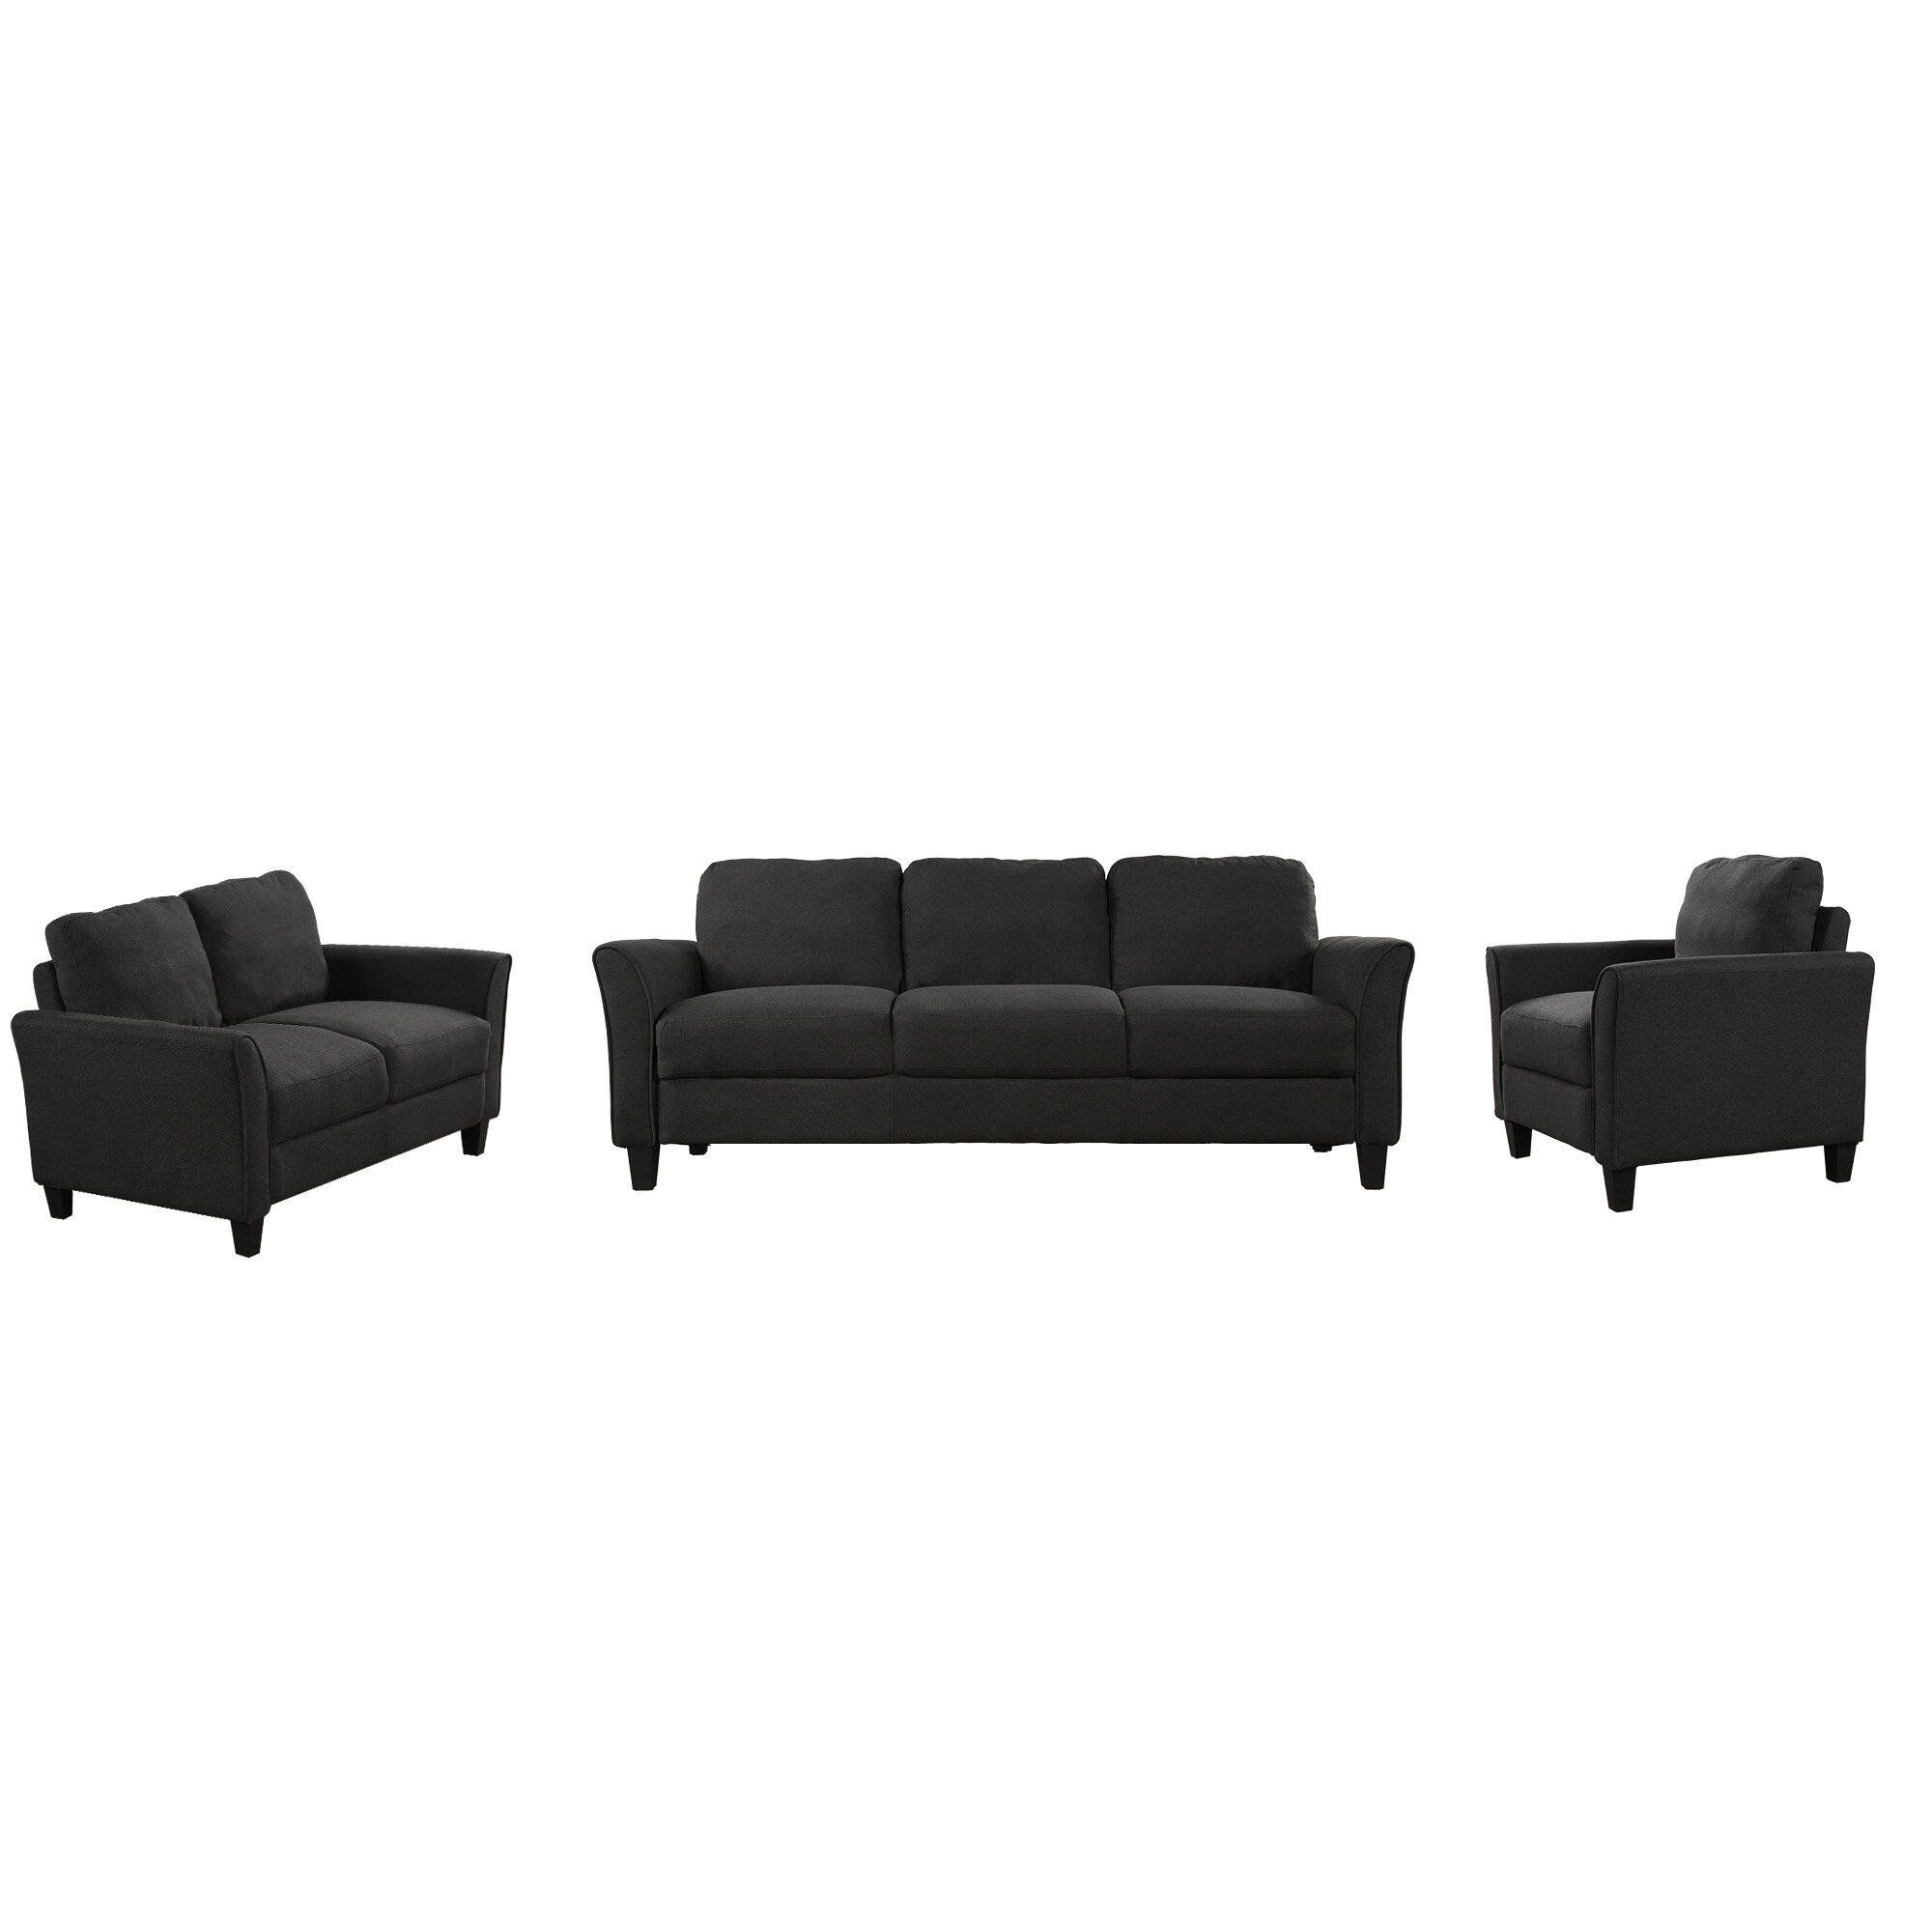 Red Barrel Studio Abruscato 3 Pieces Standard Living Room Set Wayfair